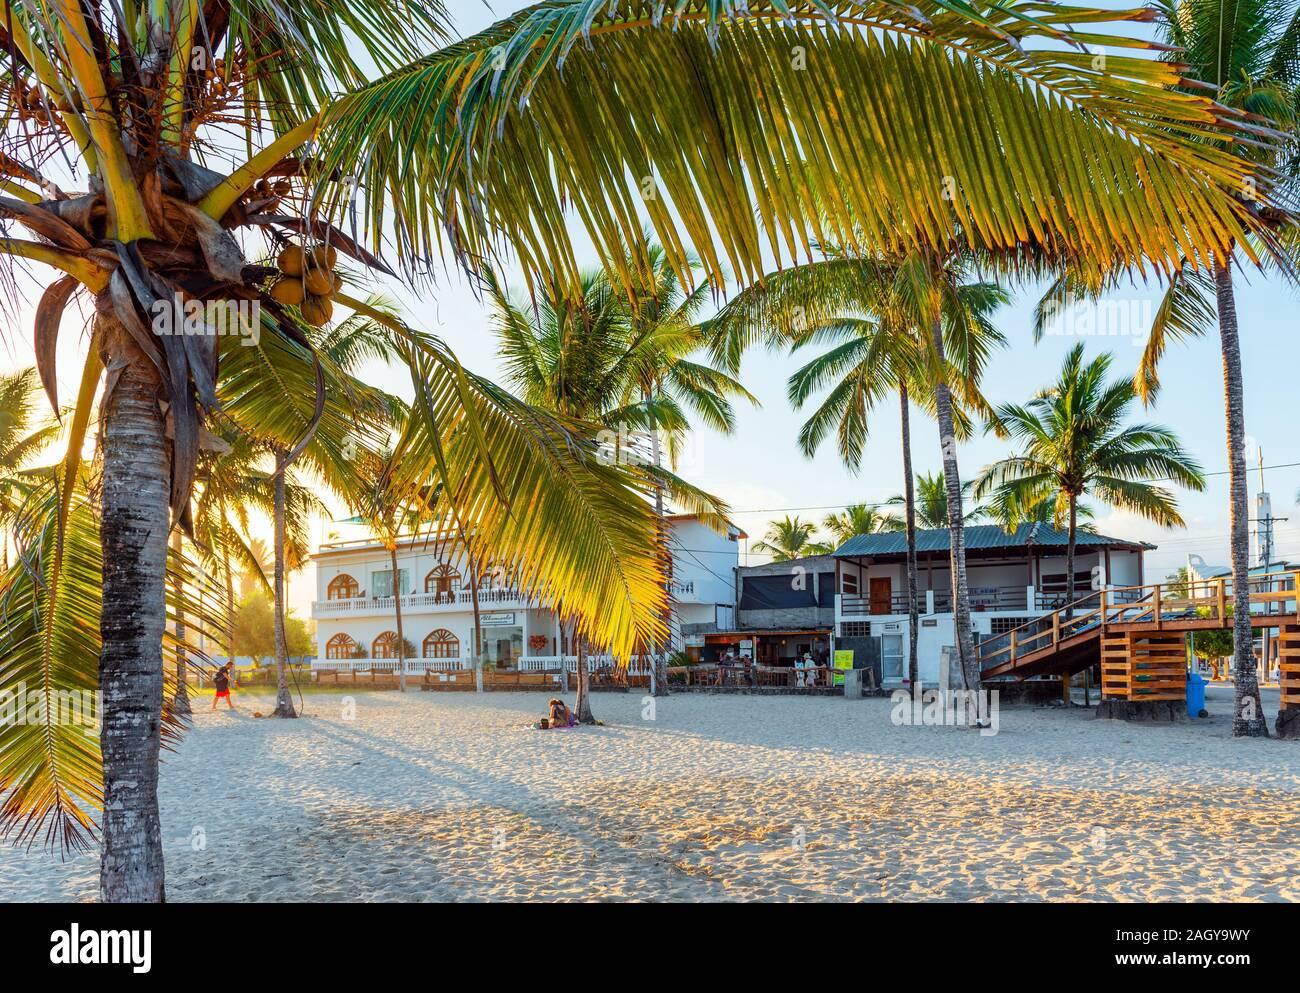 Galapagos Island Isla Isabela July 2 2019 Coconut Tree